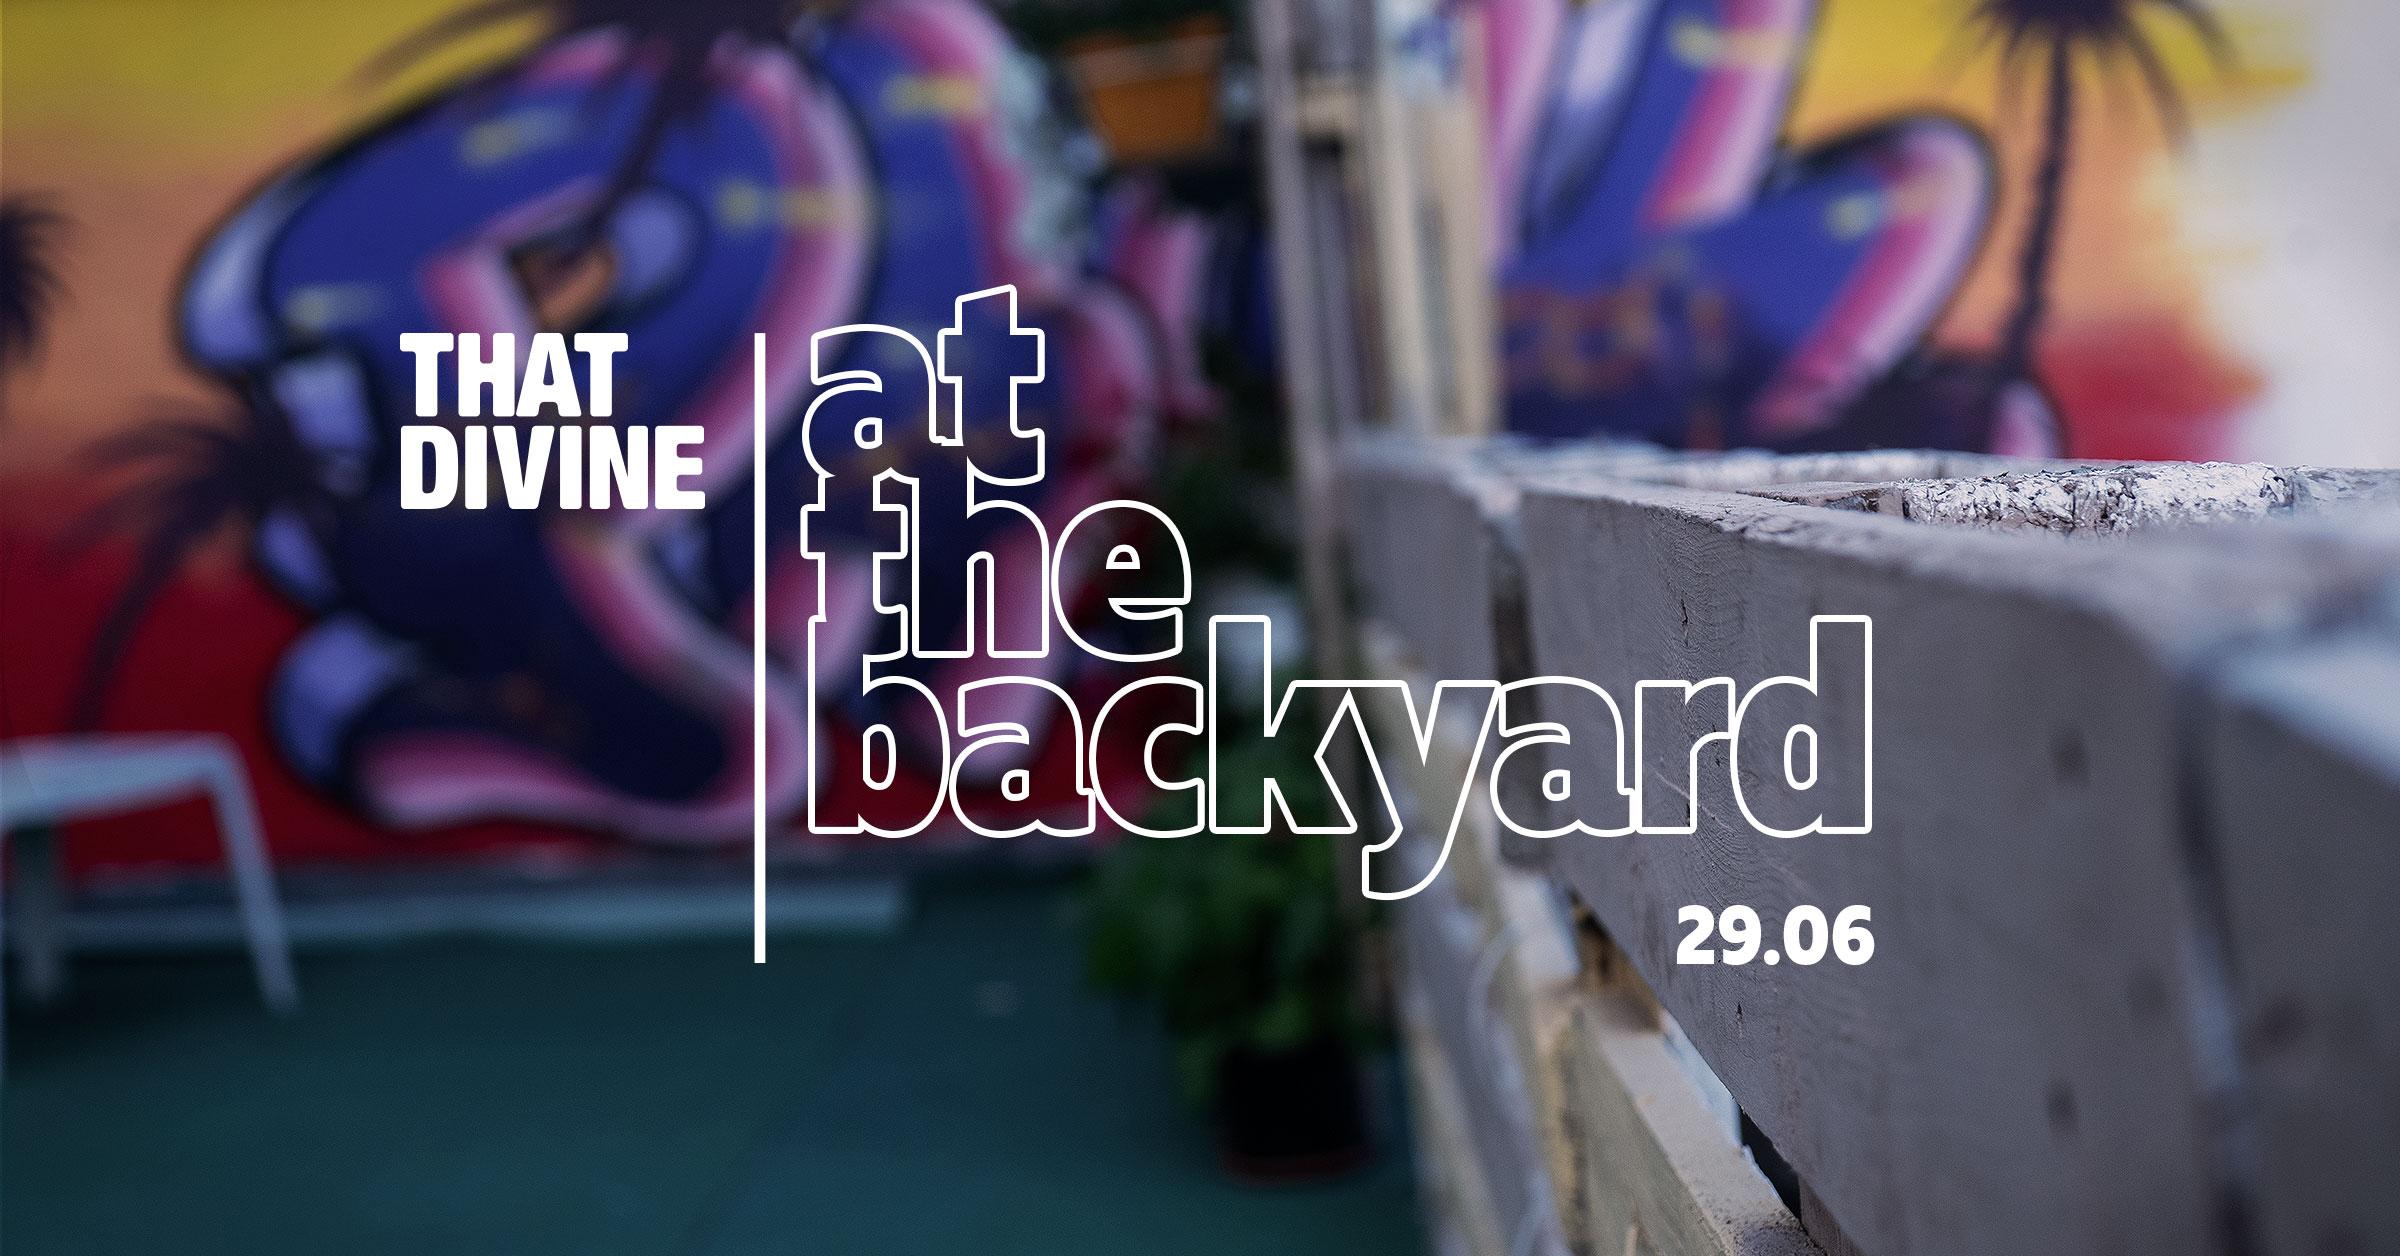 TD-@-Backyard-04-Event-Cover.jpg